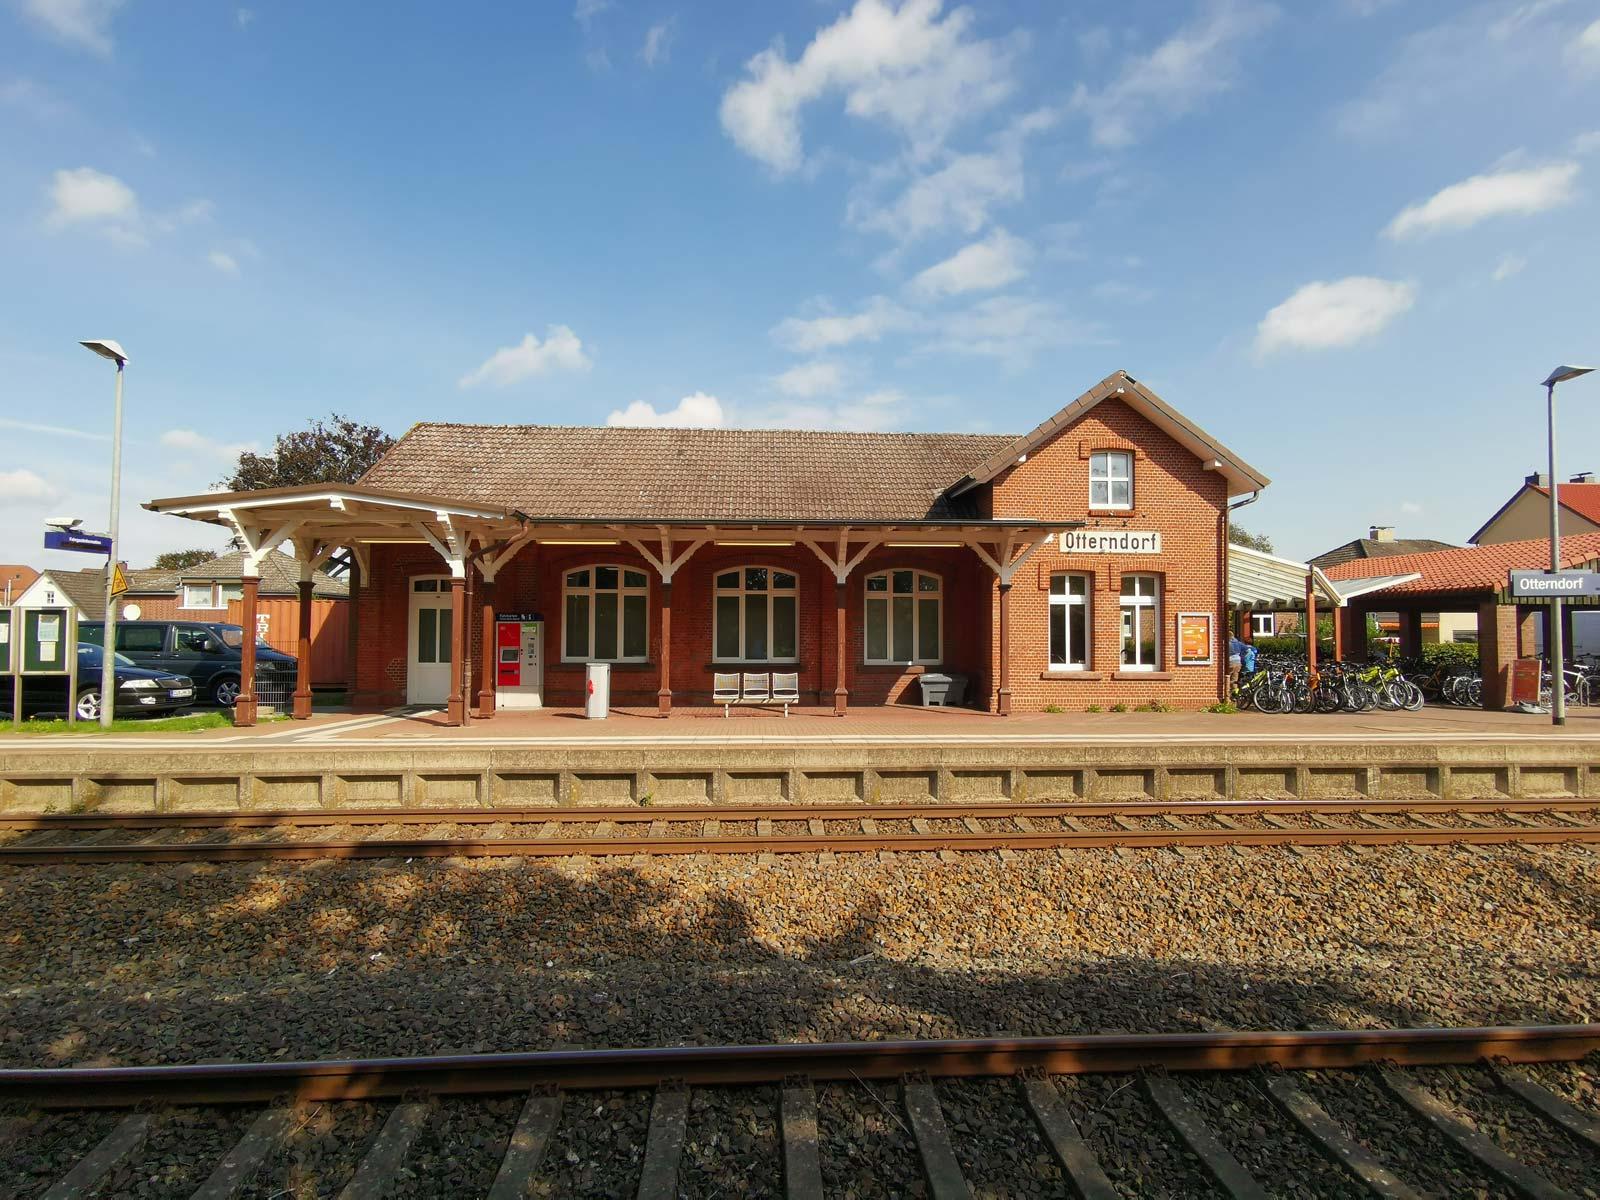 Bahnhof Otterndorf